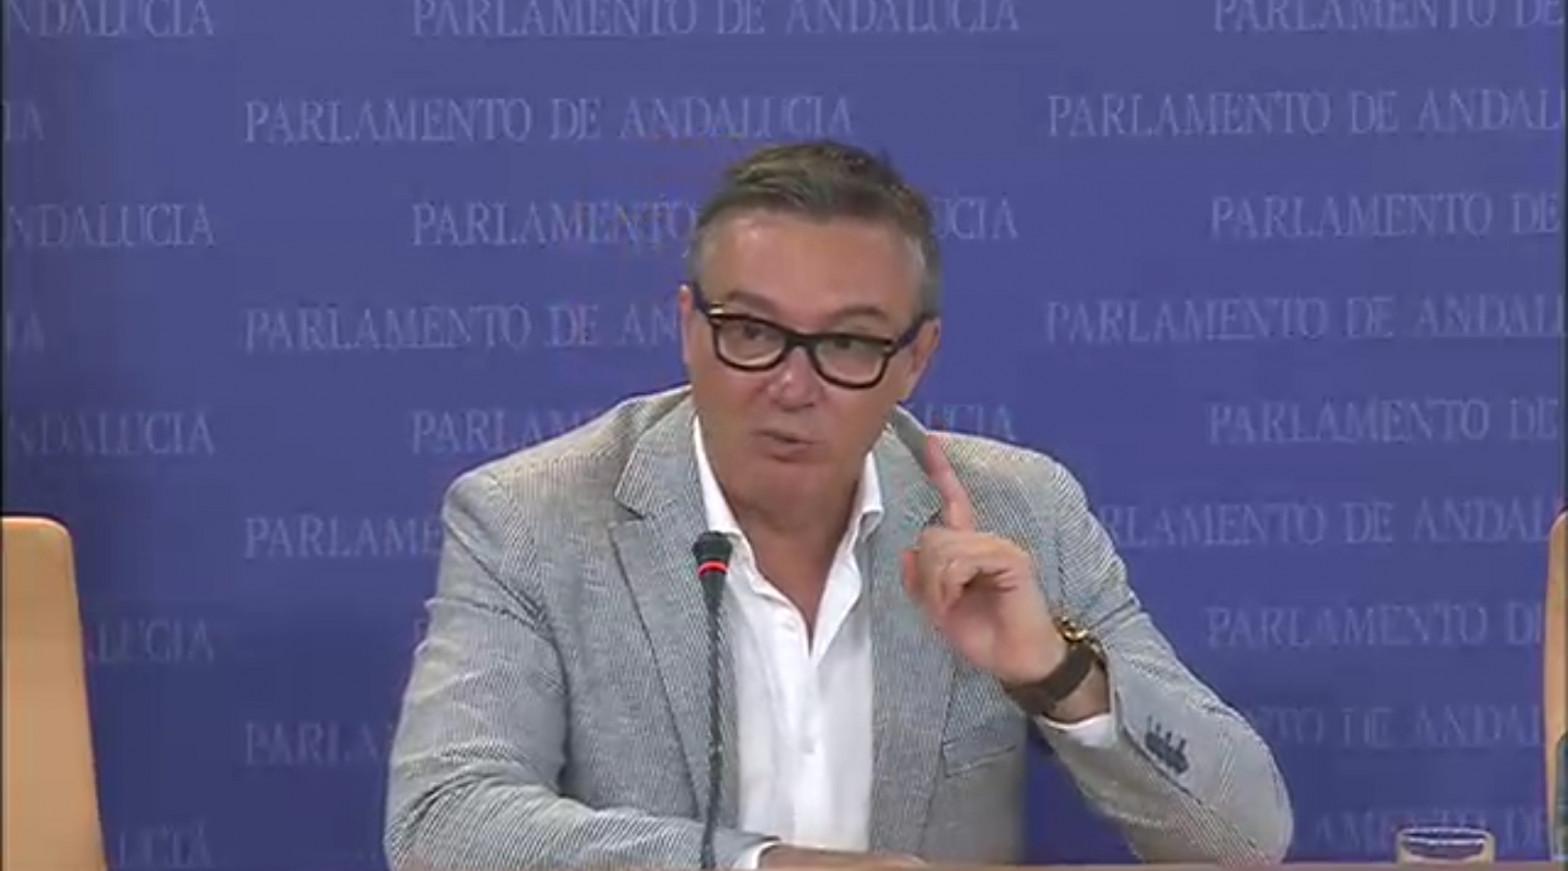 El portavoz de Vox en el Parlamento, Manuel Gavira.